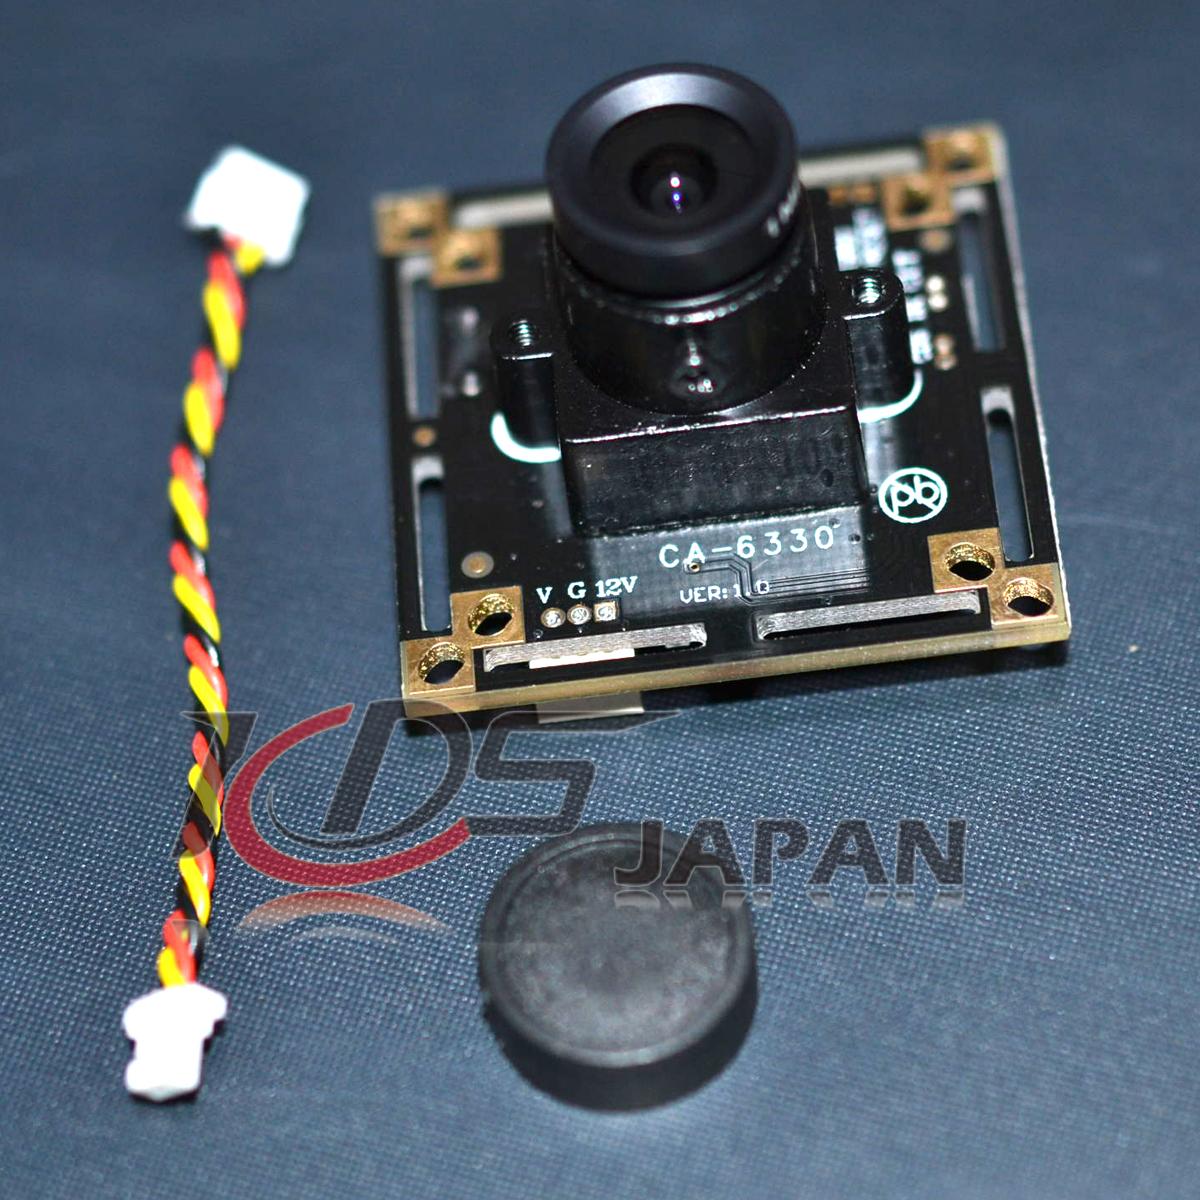 Kylin250/280 Class FPV Racer用ビューカメラ HD 800TVL